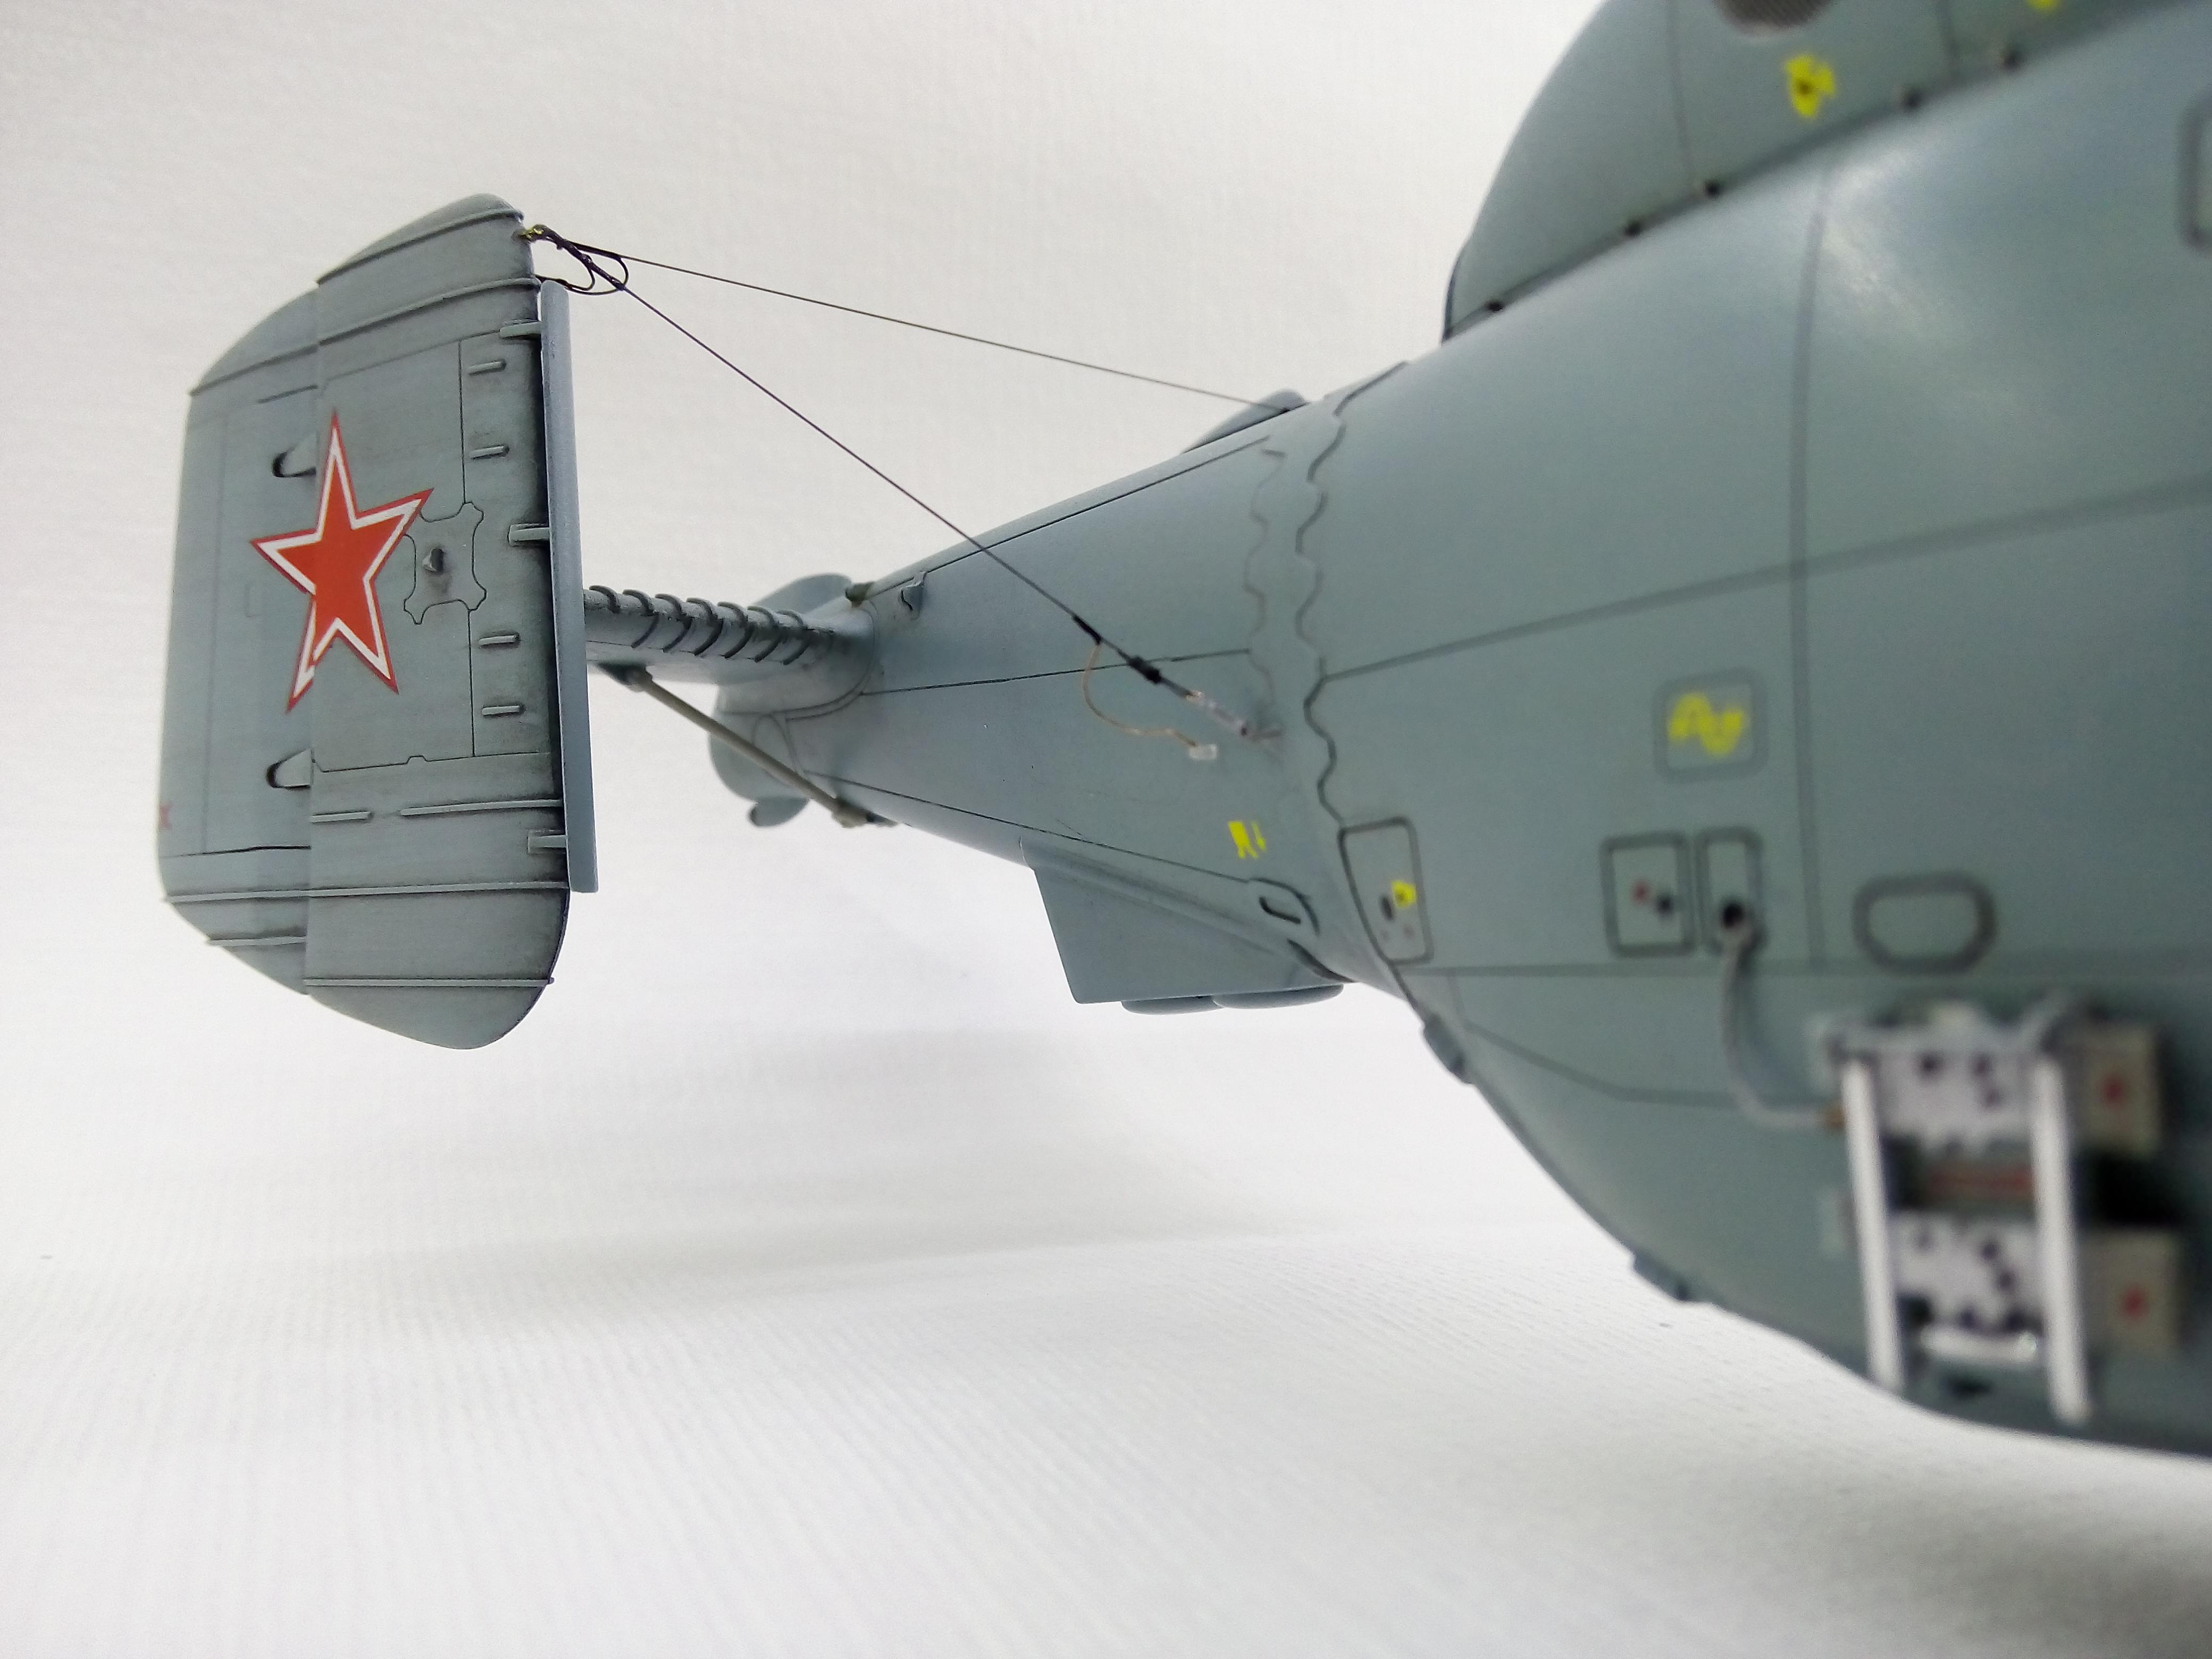 Ка-27ПЛ 1/48 HOBBYBOSS - Страница 3 4683cb943df2